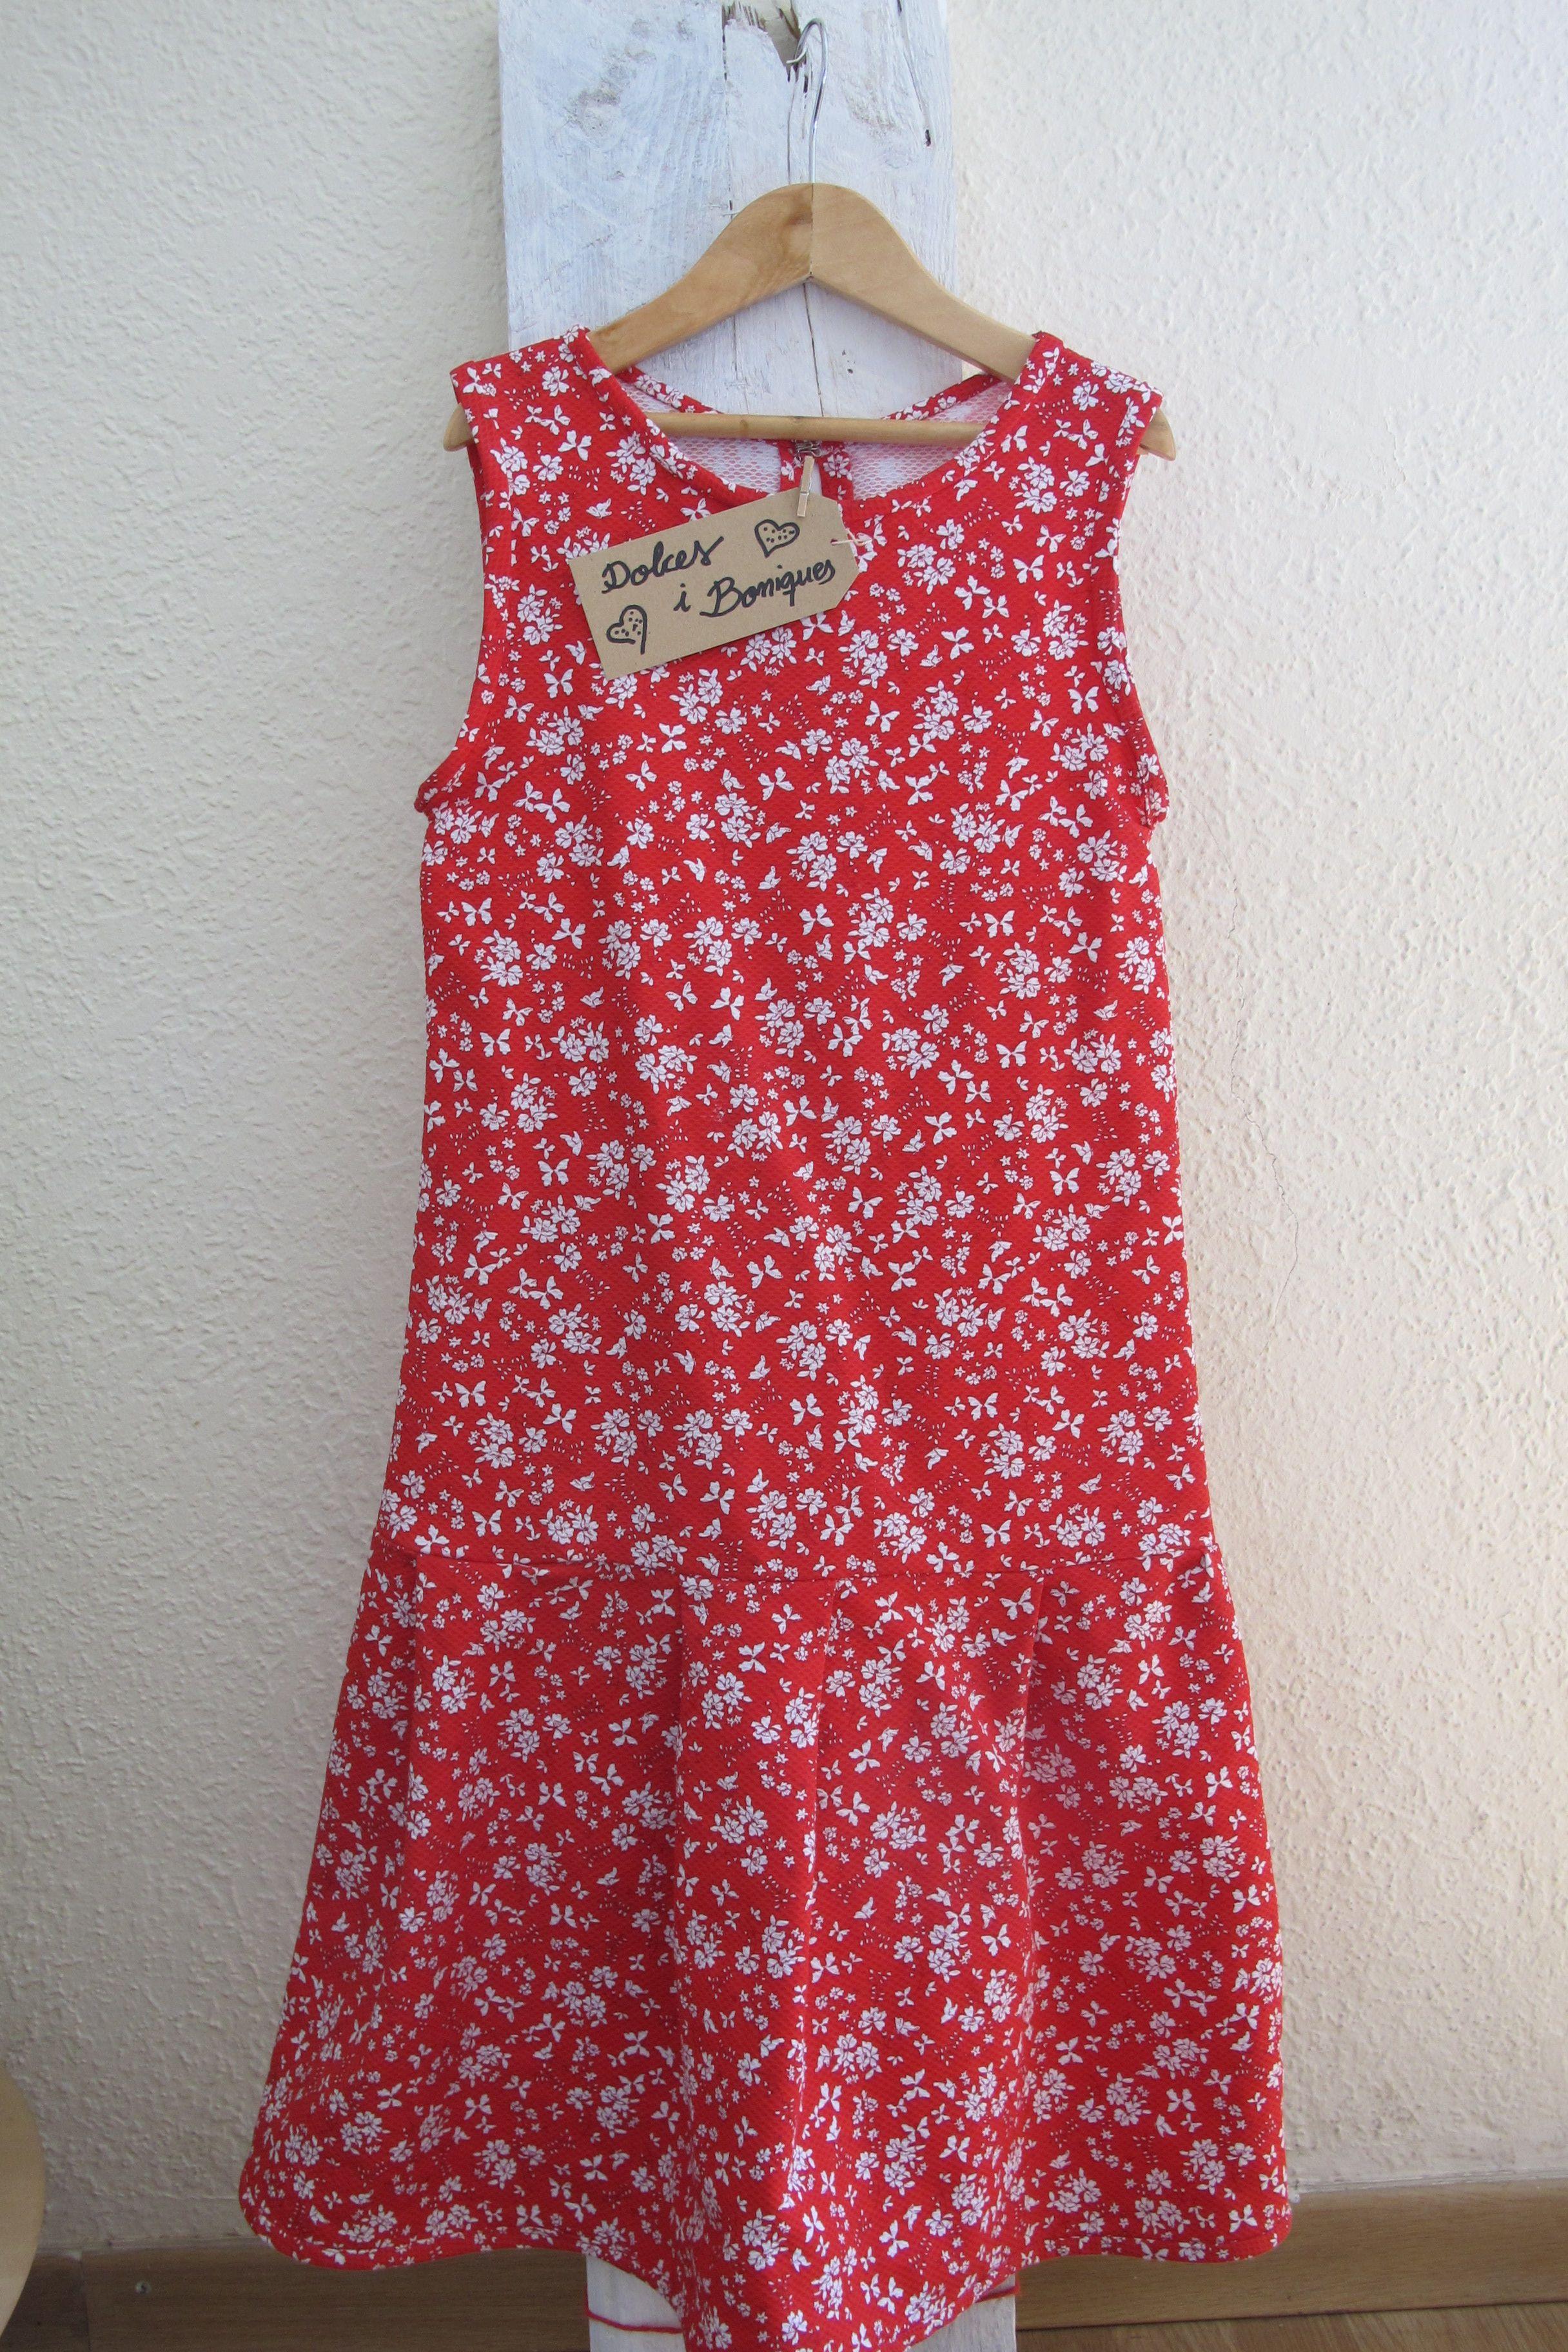 ff5e484ff Vestido para niña de 9 años   Vestit per a nena de 9 anys.